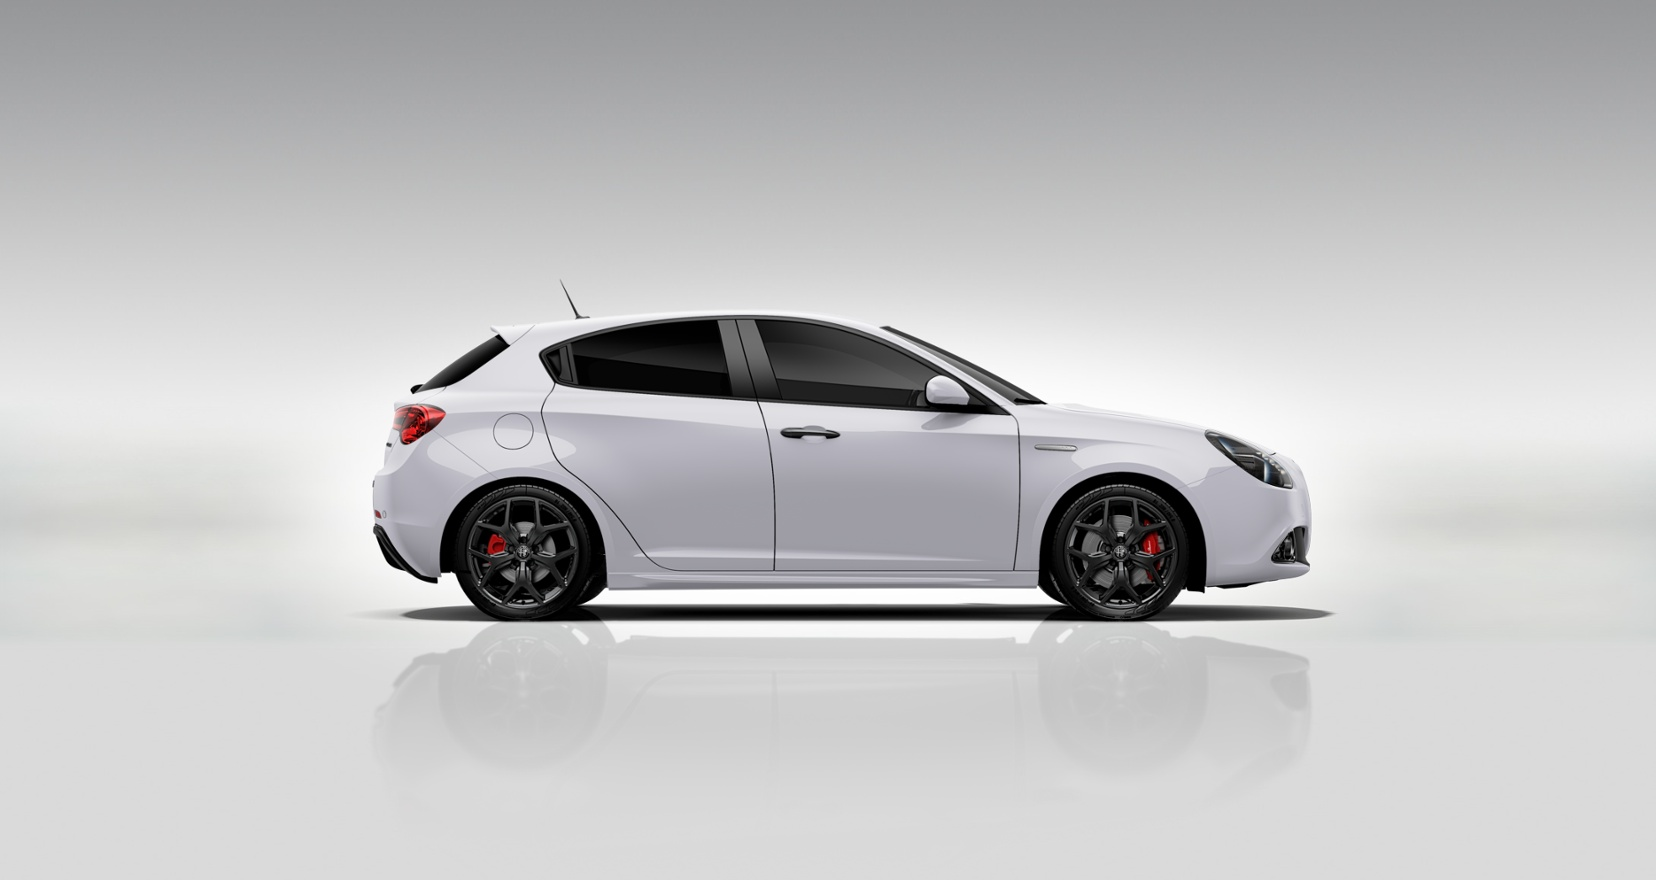 Alfa Romeo Giulietta Sprint wit - zijkant